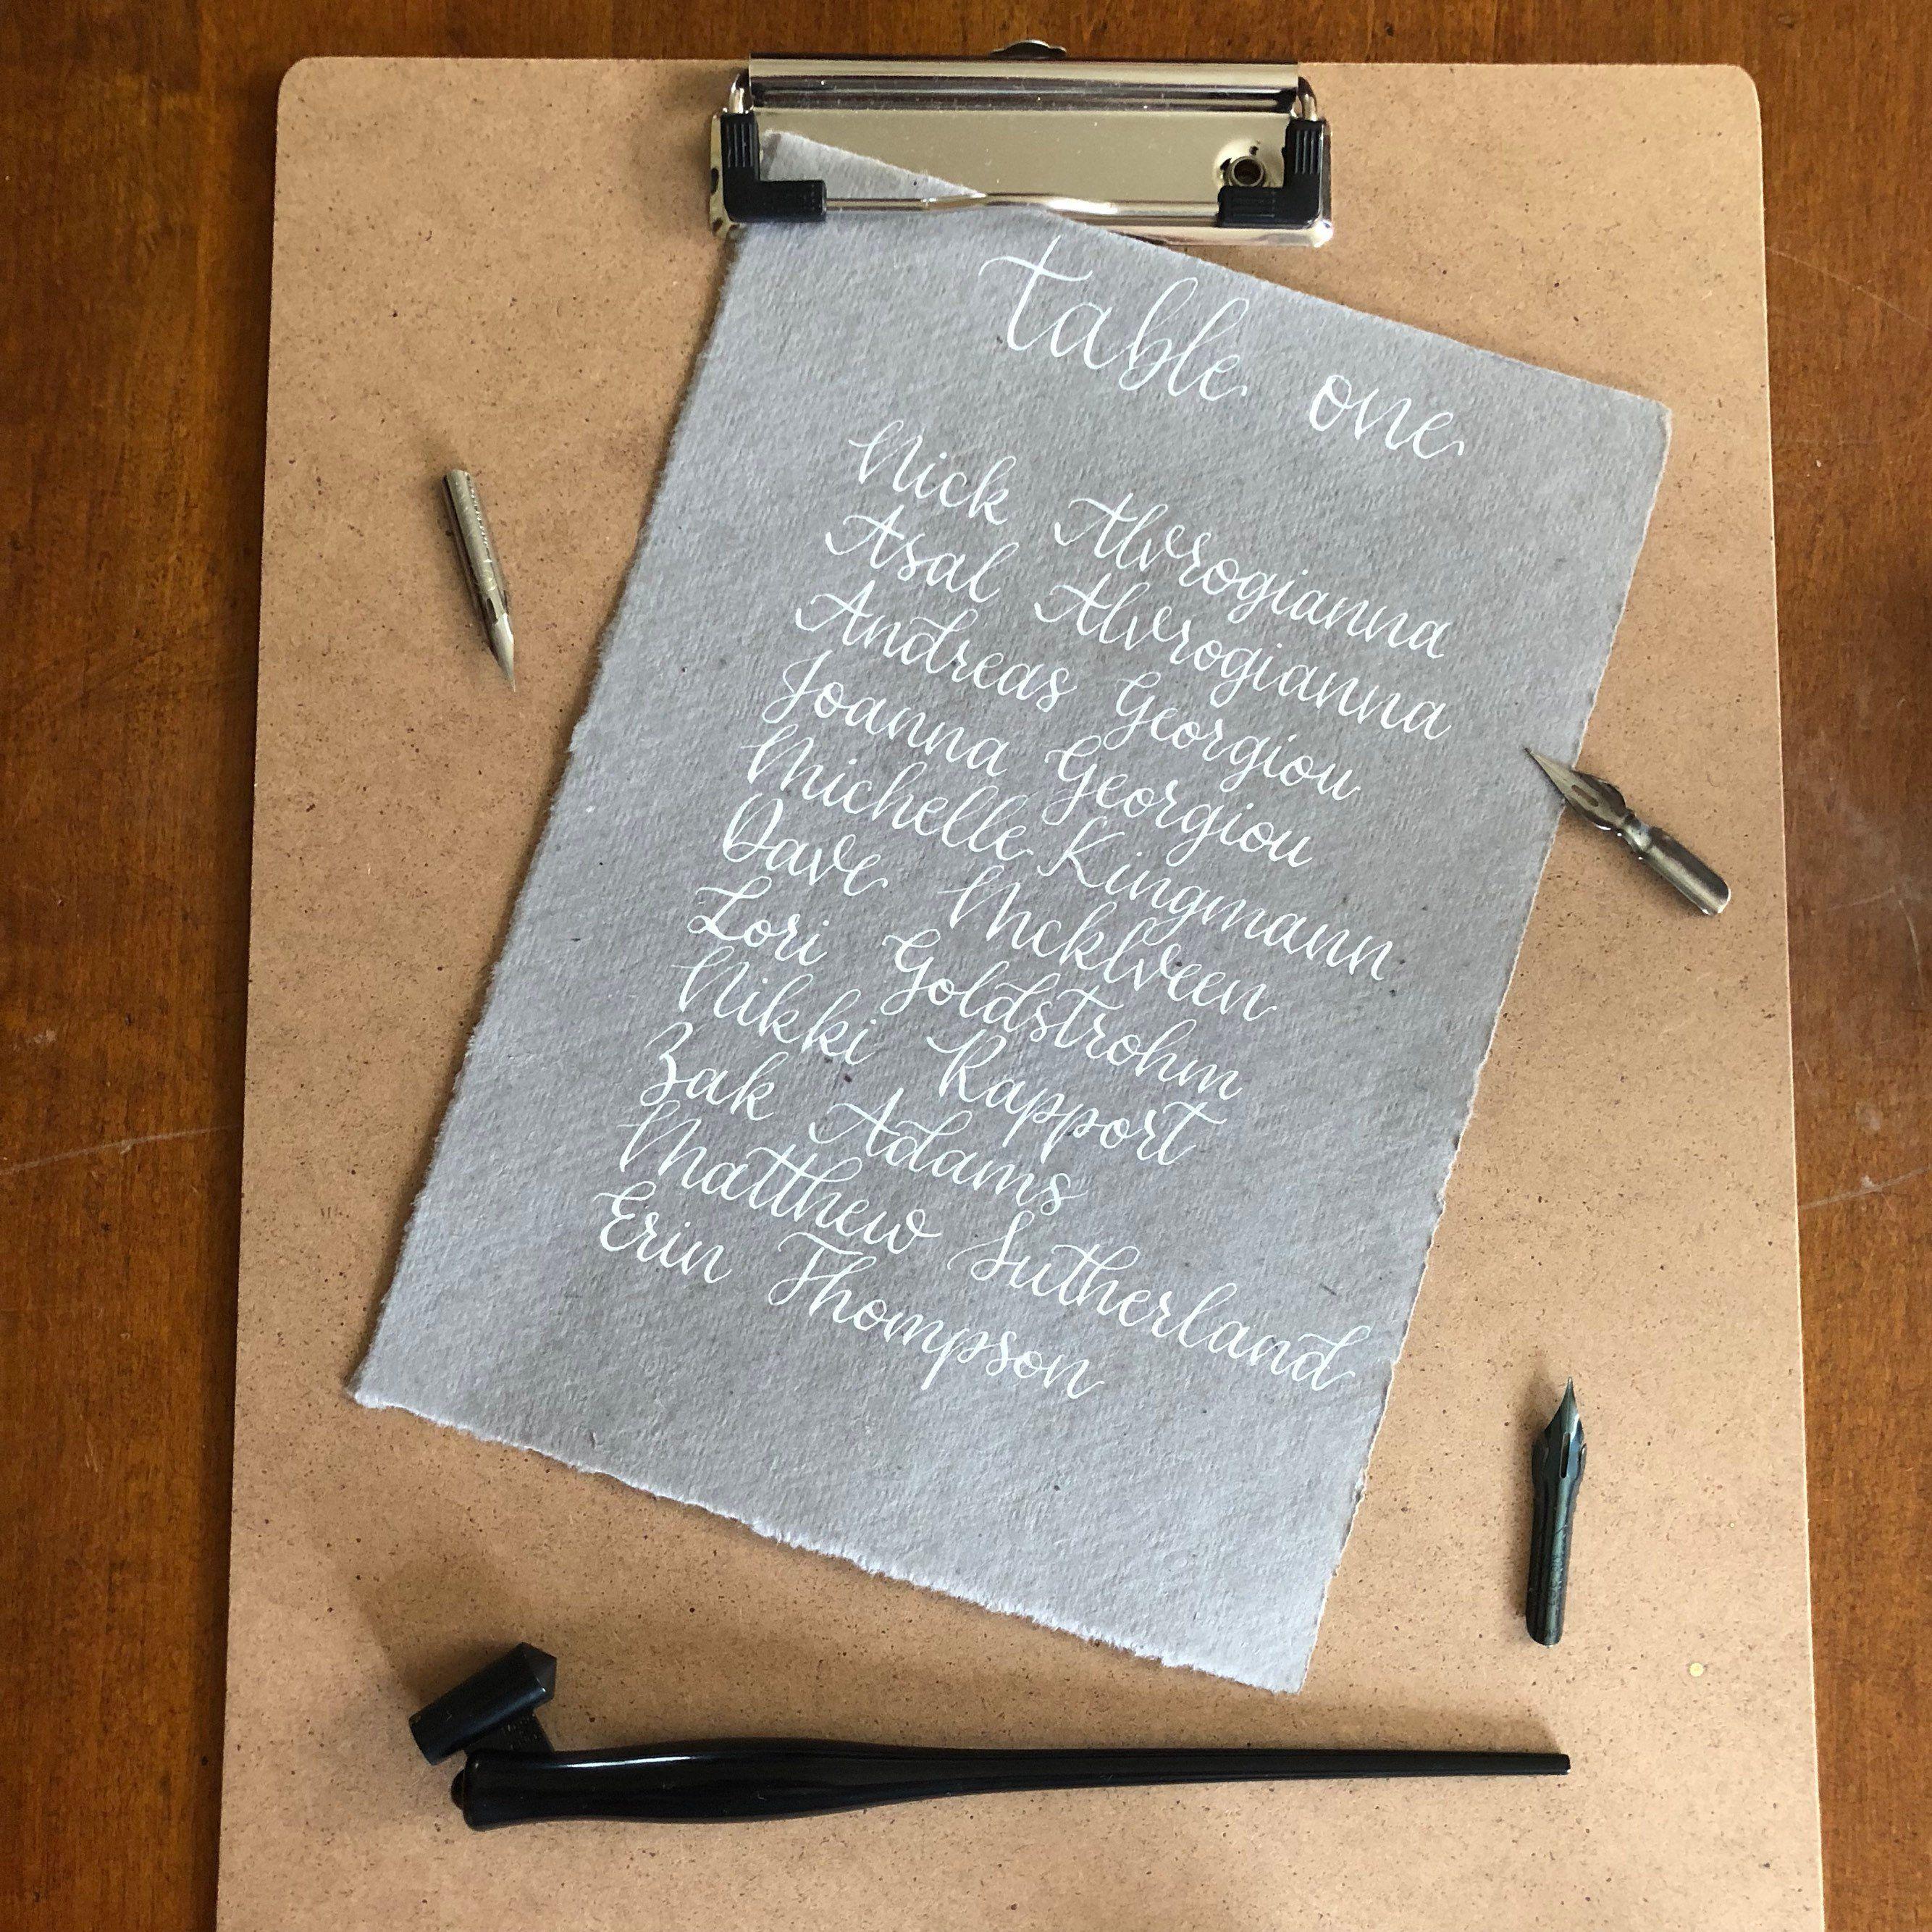 Calligraphy Seating Chart Cotton Rag Seating Plan Gray Wedding Seating Chart Handwritten Table Chart Handmade Cotton Rag Custom Seating